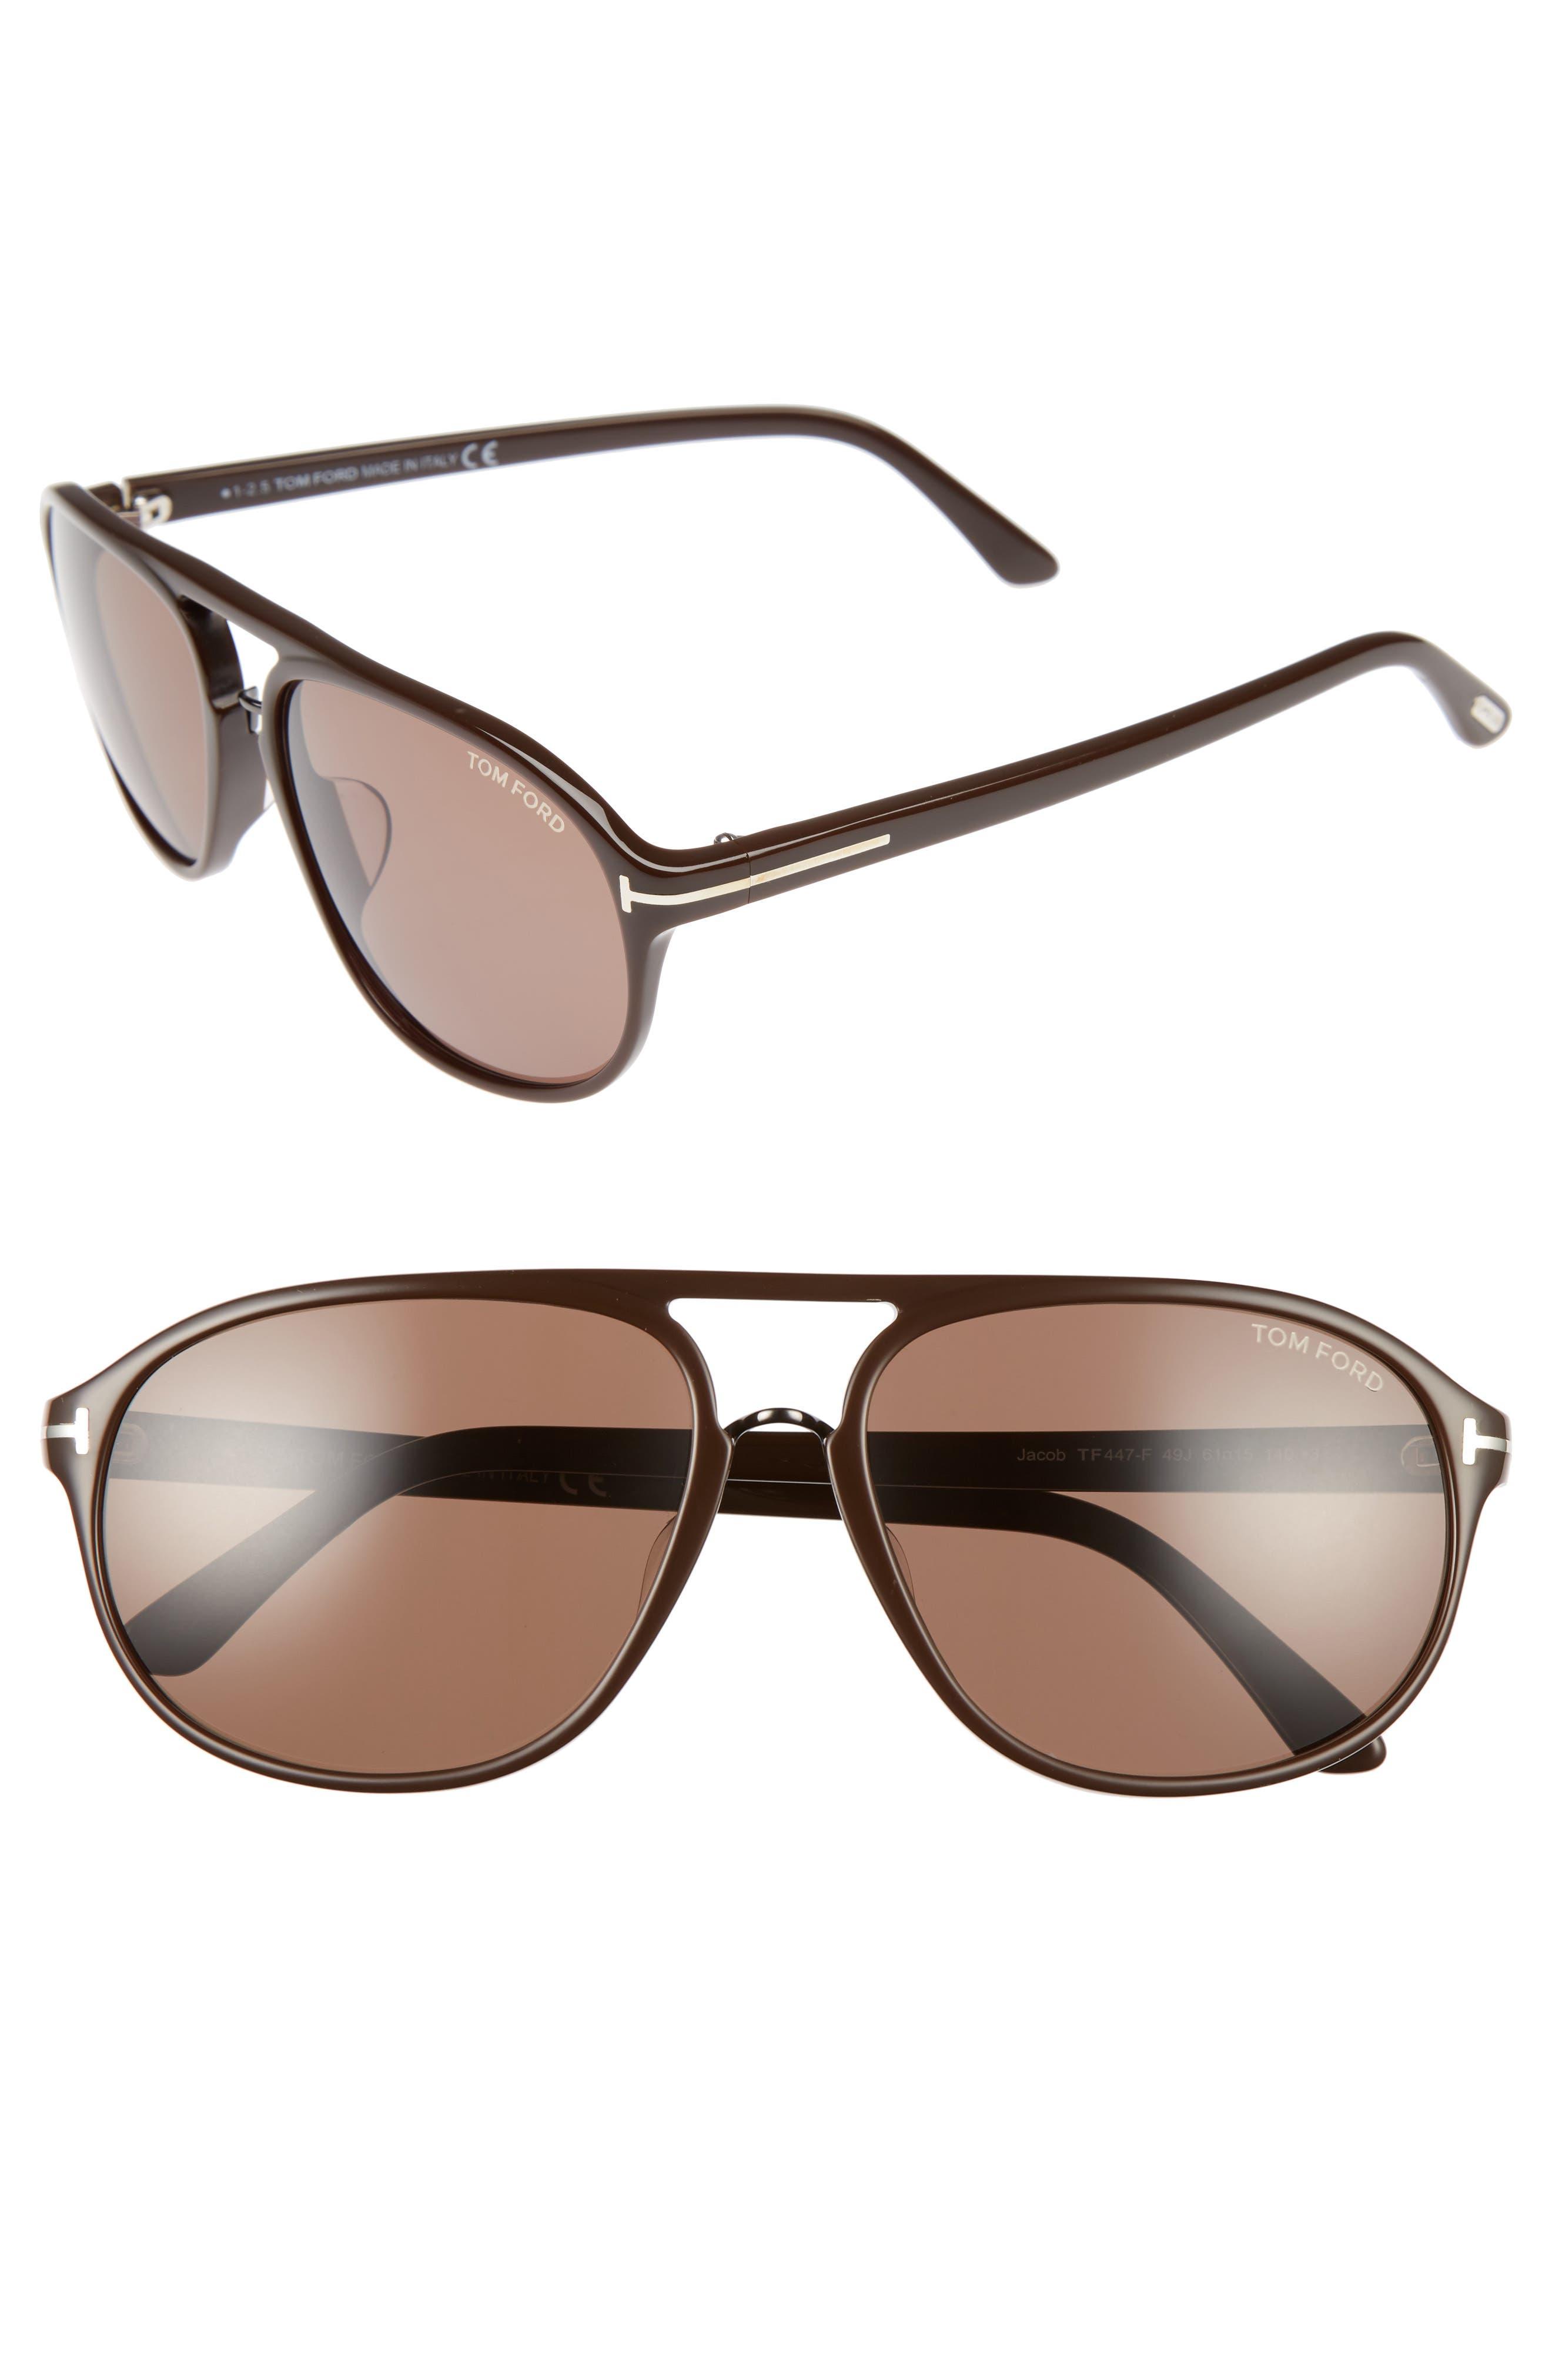 Jacob 61mm Special Fit Aviator Sunglasses,                         Main,                         color, Matte Dark Brown/ Roviex